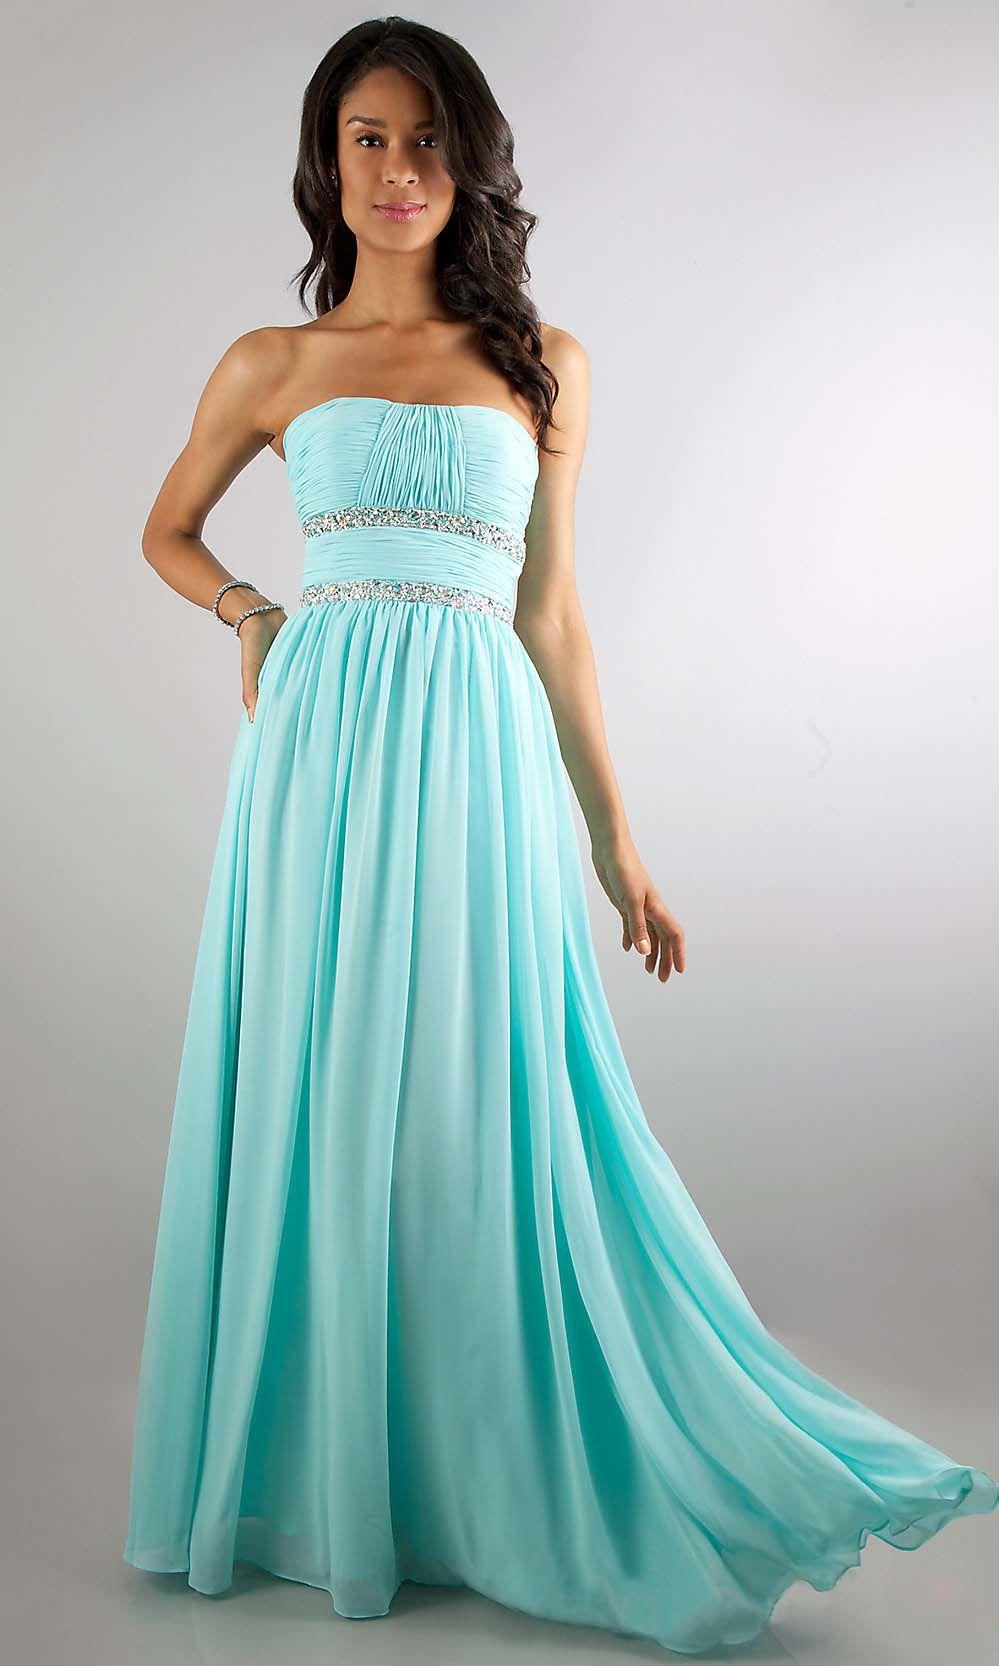 Long tiffany blue bridesmaid dresses 2014 tiffany blue for Wedding dresses with tiffany blue